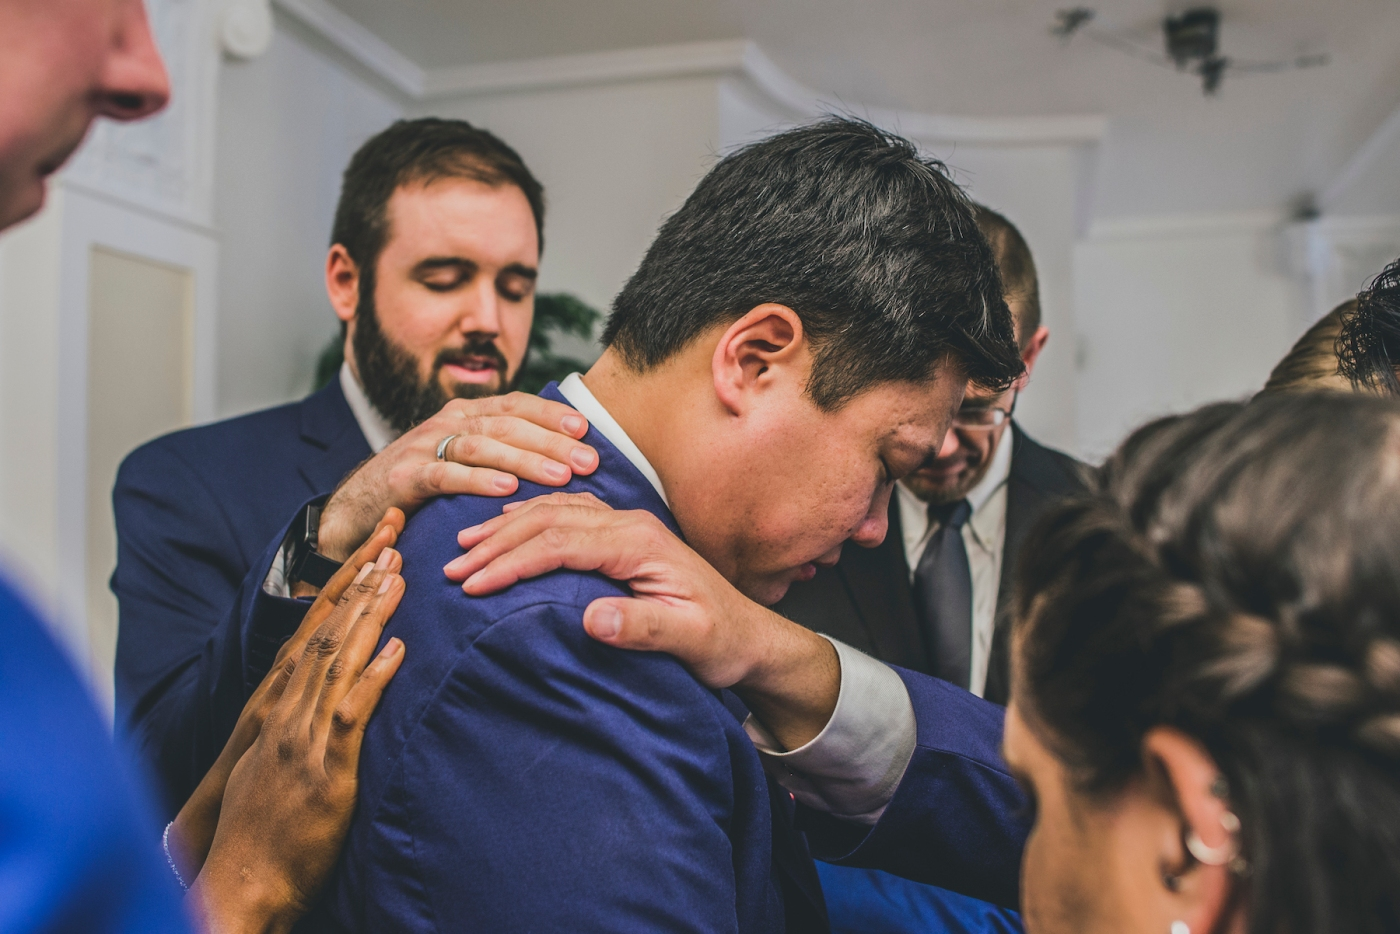 DSC_2390Everett_Wedding_Ballroom_Jane_Speleers_photography_Rachel_and_Edmund_Praying_2017